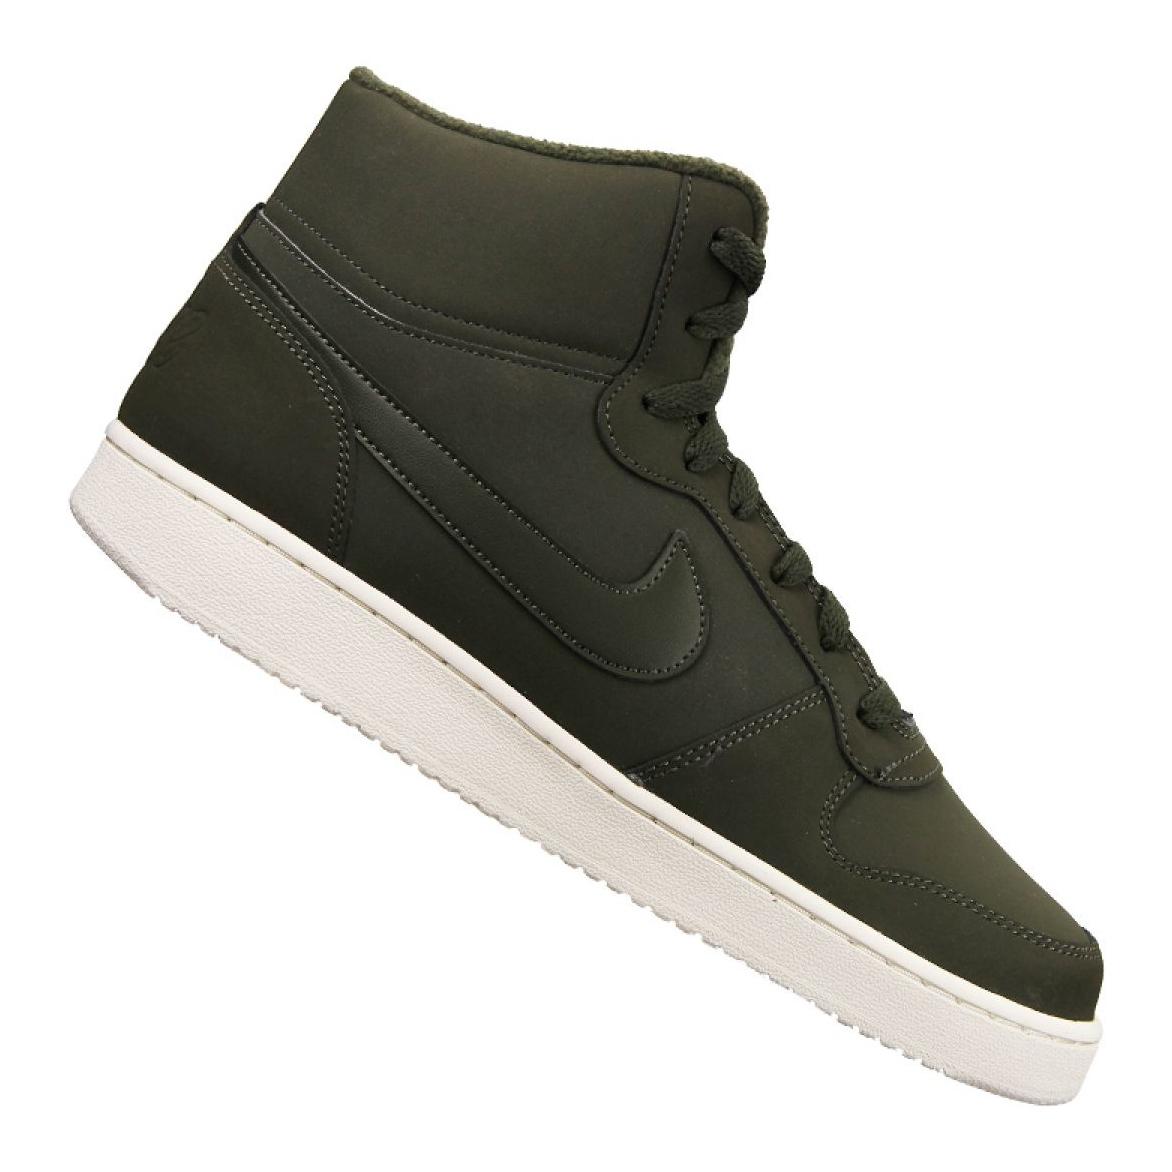 Details about Nike Ebernon Mid Se M AQ8125,300 shoes green